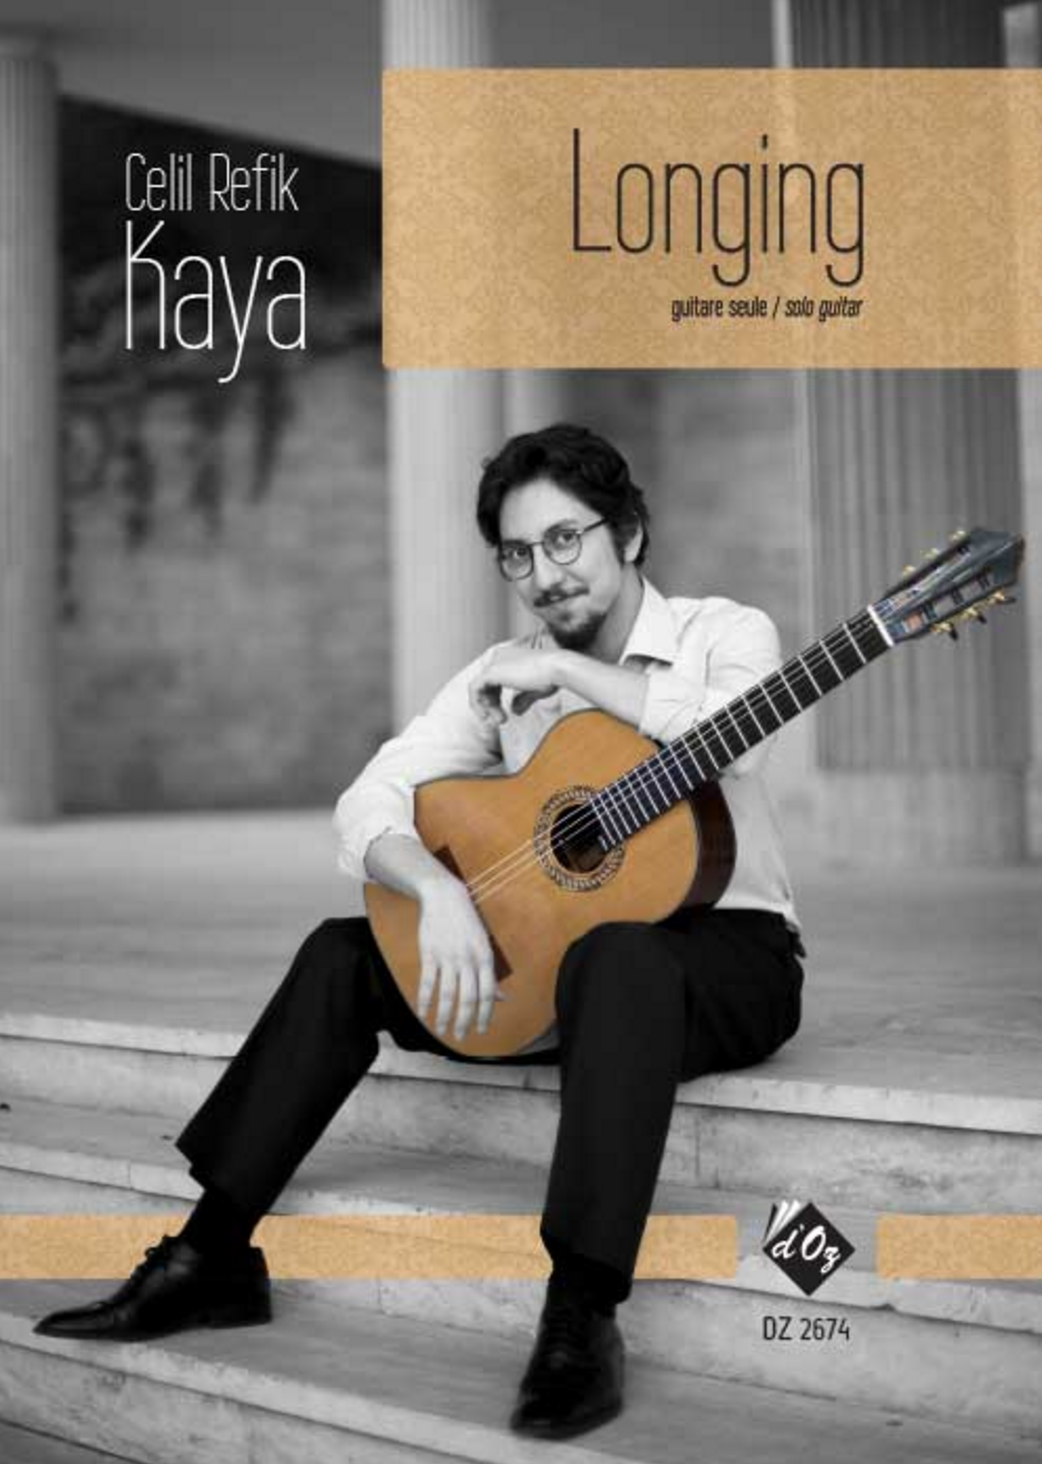 Longing for solo guitar Composer : Celil Refik Kaya Published: Les Productions d'OZ